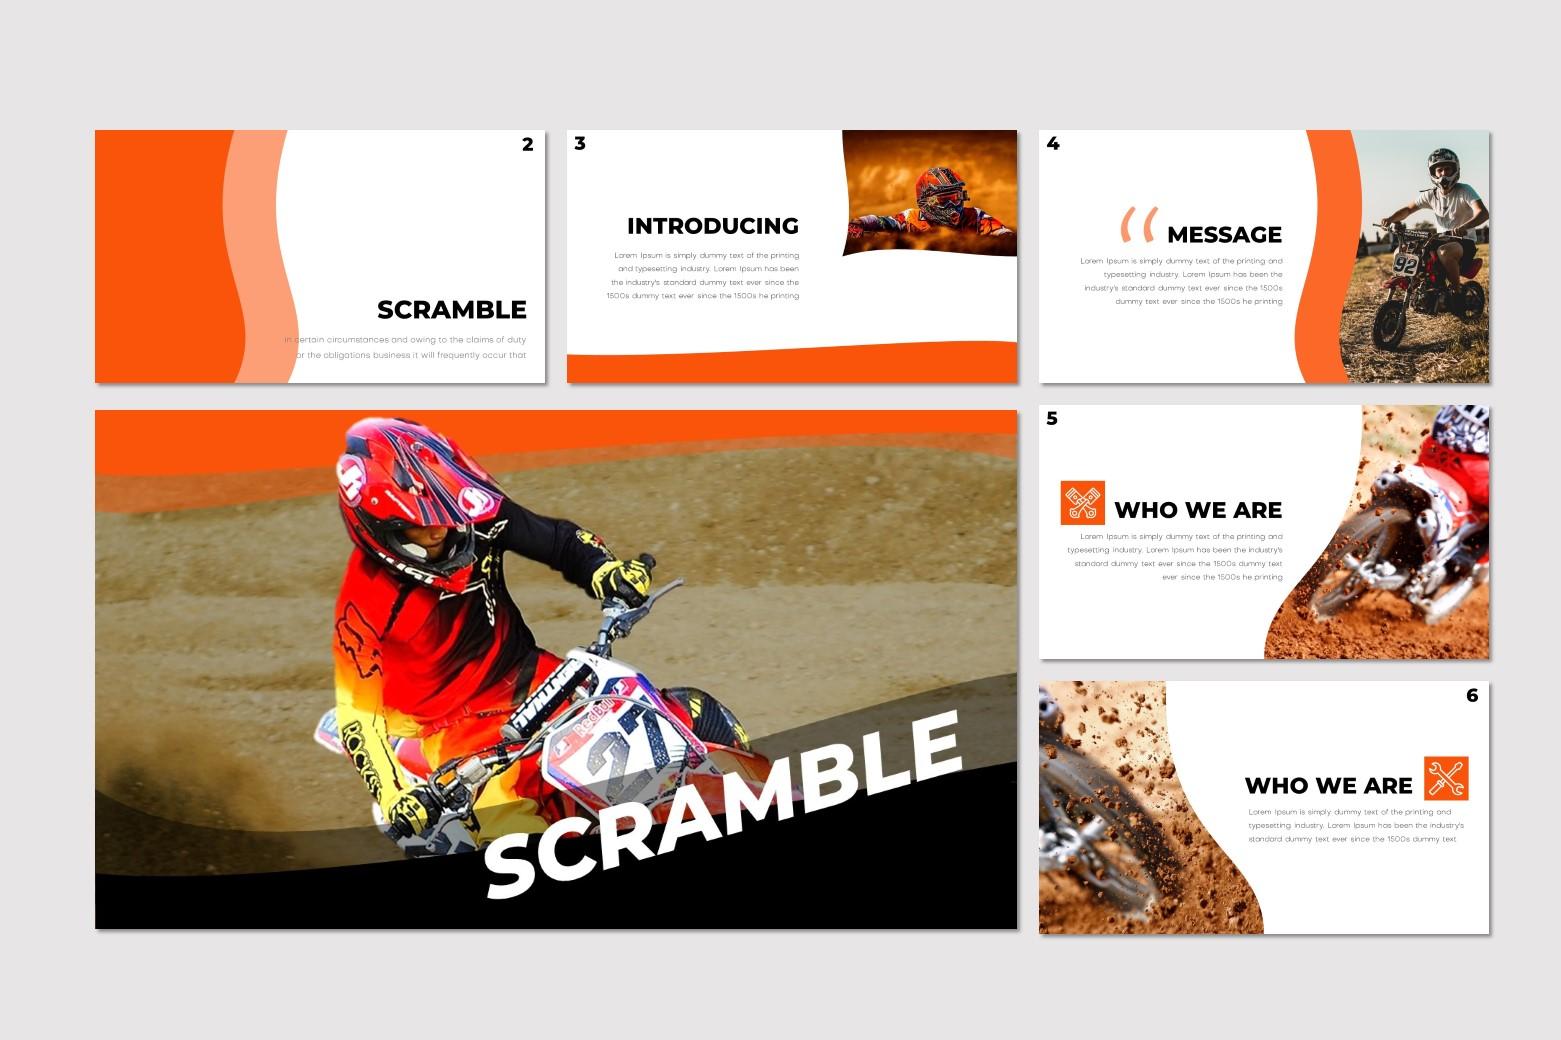 Scramble - Google Slides Template example image 2